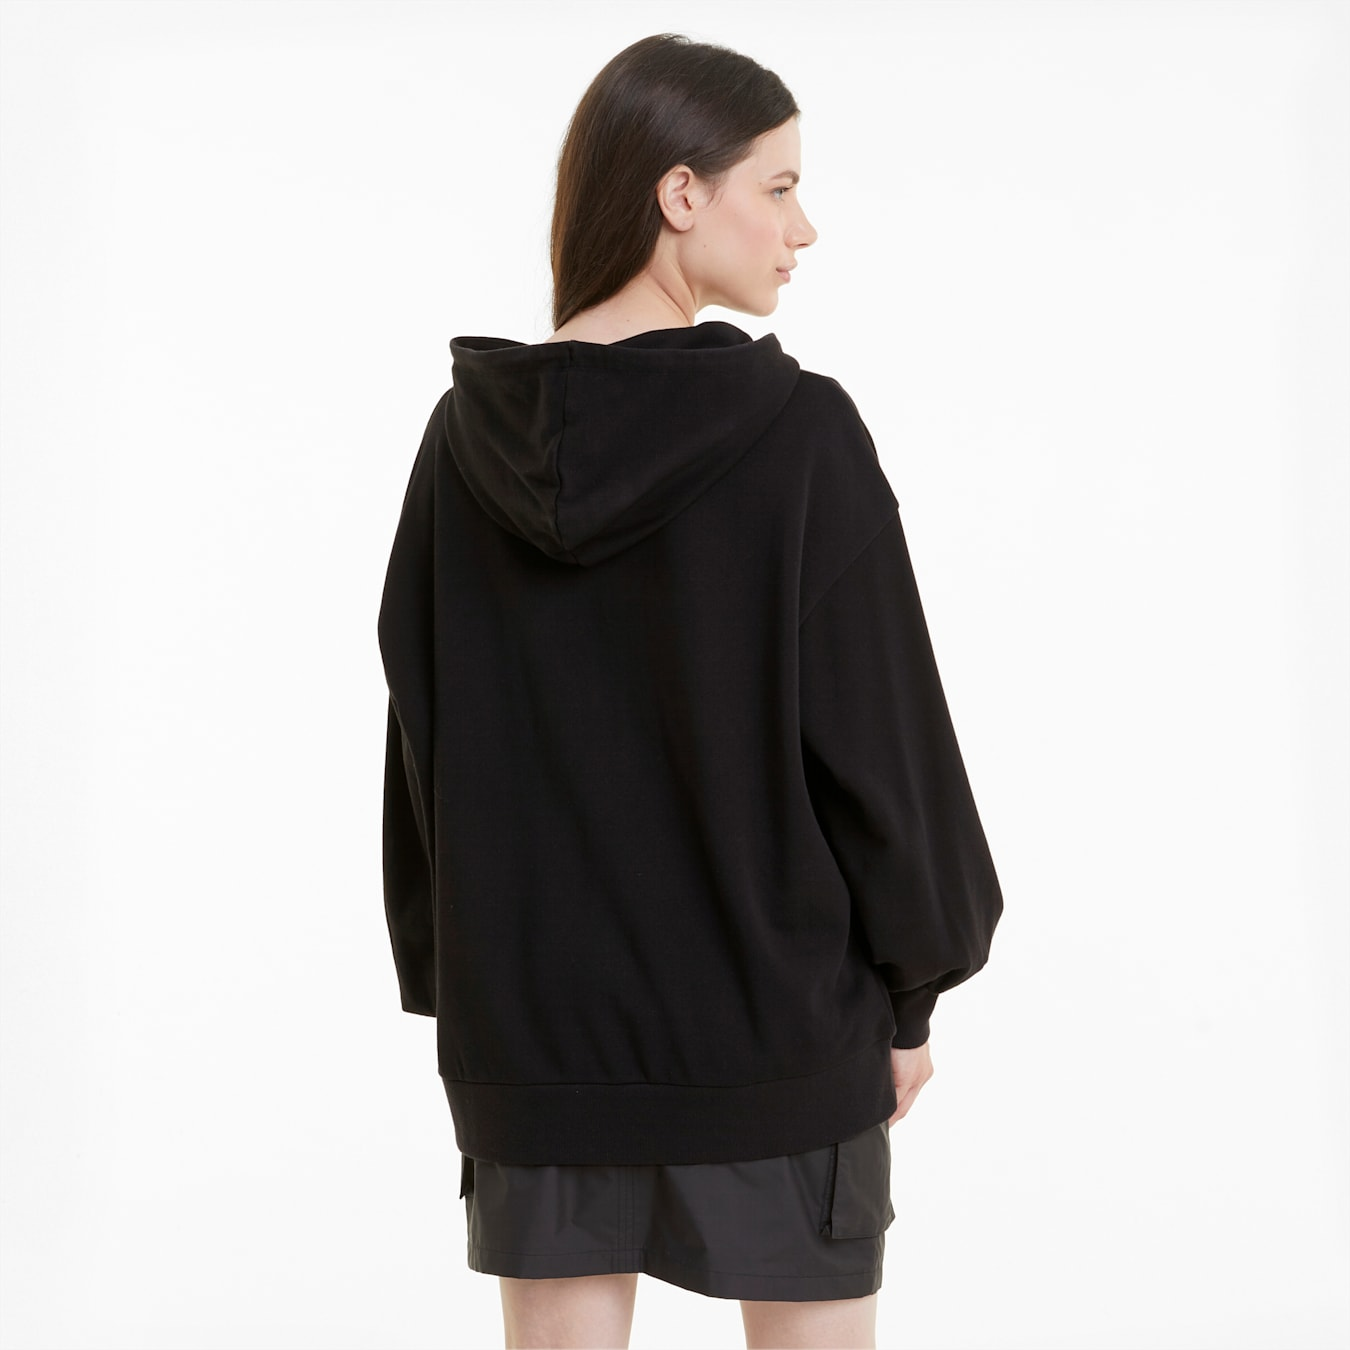 Felpa donna puma oversize Classics PUMA | 92 | 530412001